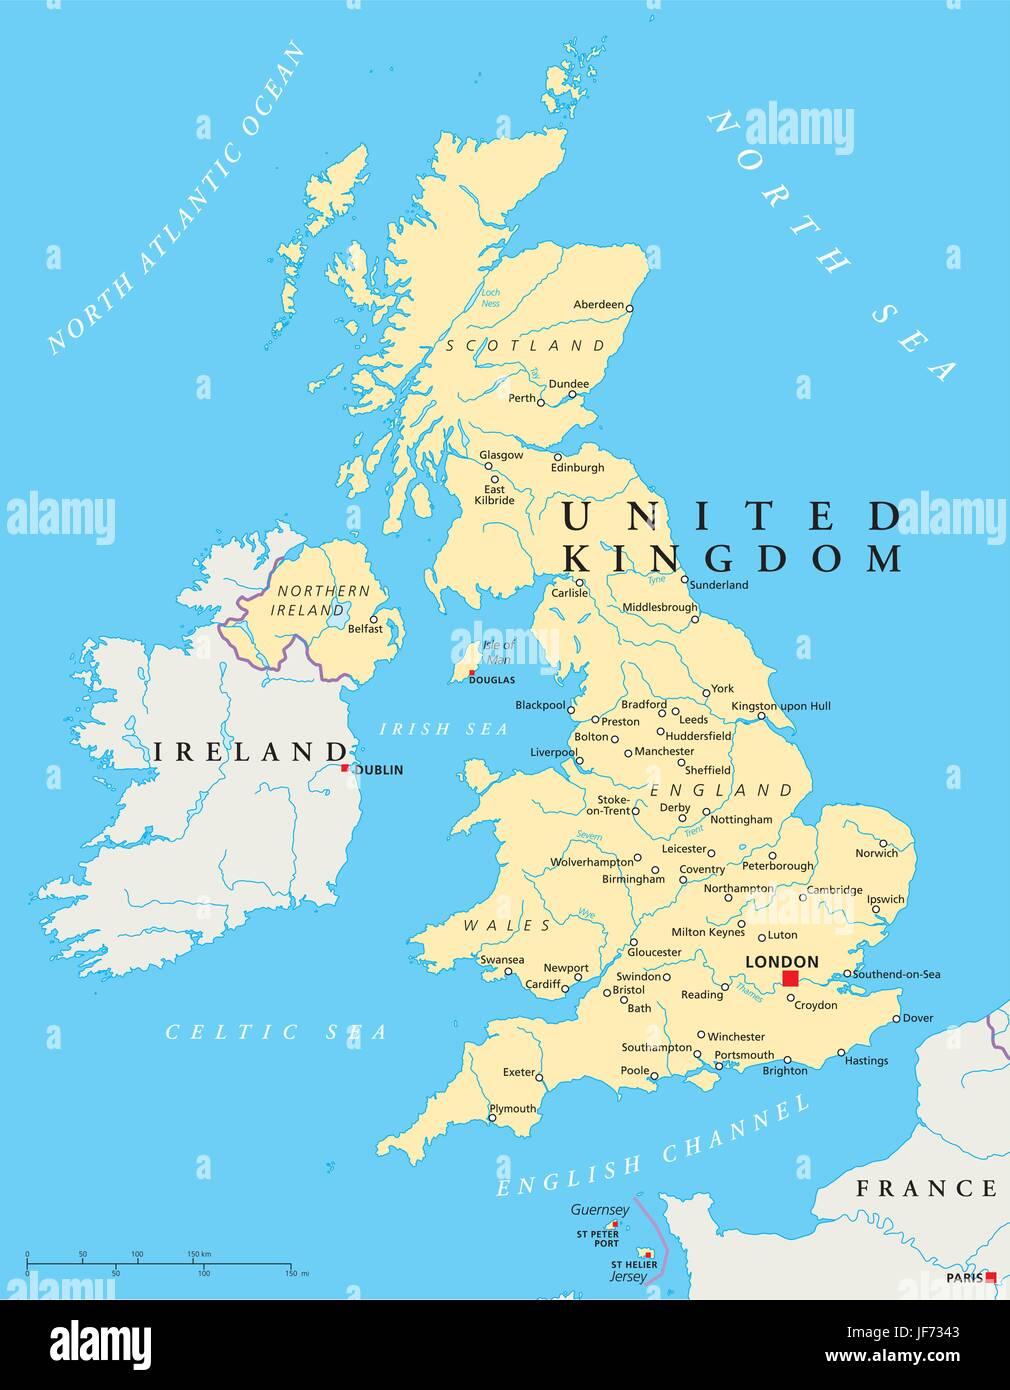 Carte Londres Angleterre.Londres Angleterre Irlande Grande Bretagne Carte Atlas